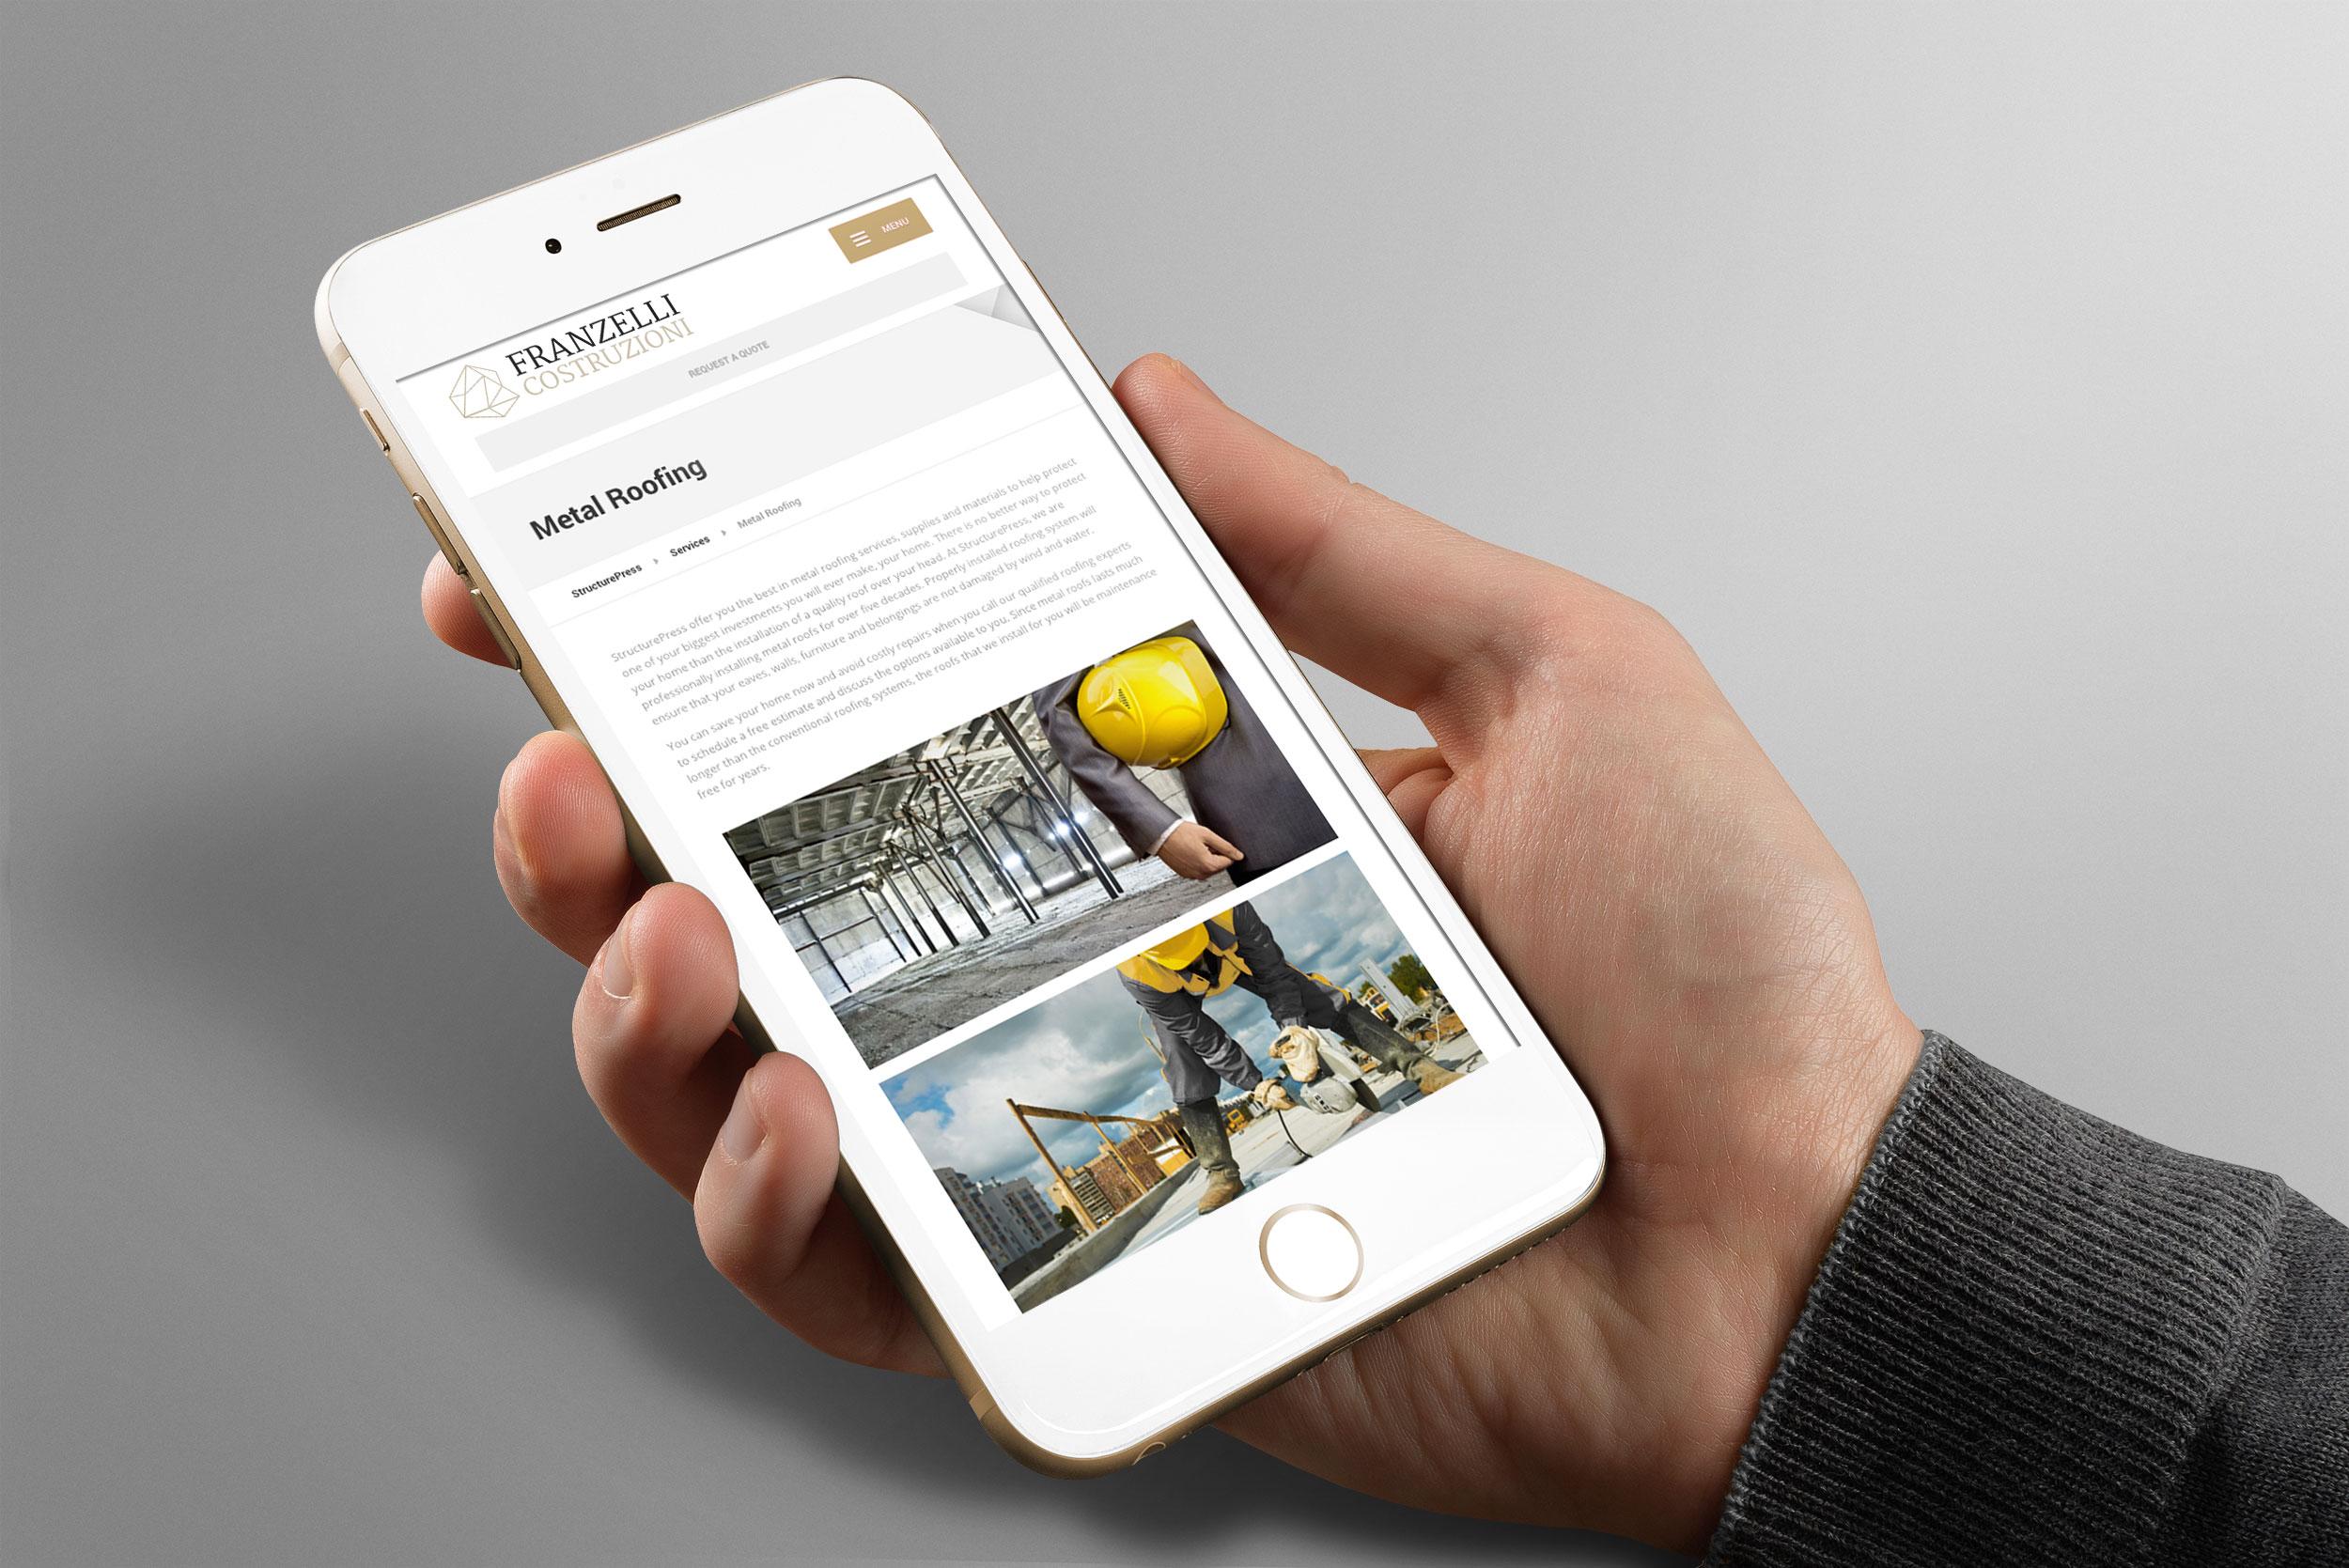 Franzelli Costruzioni - iPhone Mockup - Creativamente Agenzia di Comunicazione a Brescia